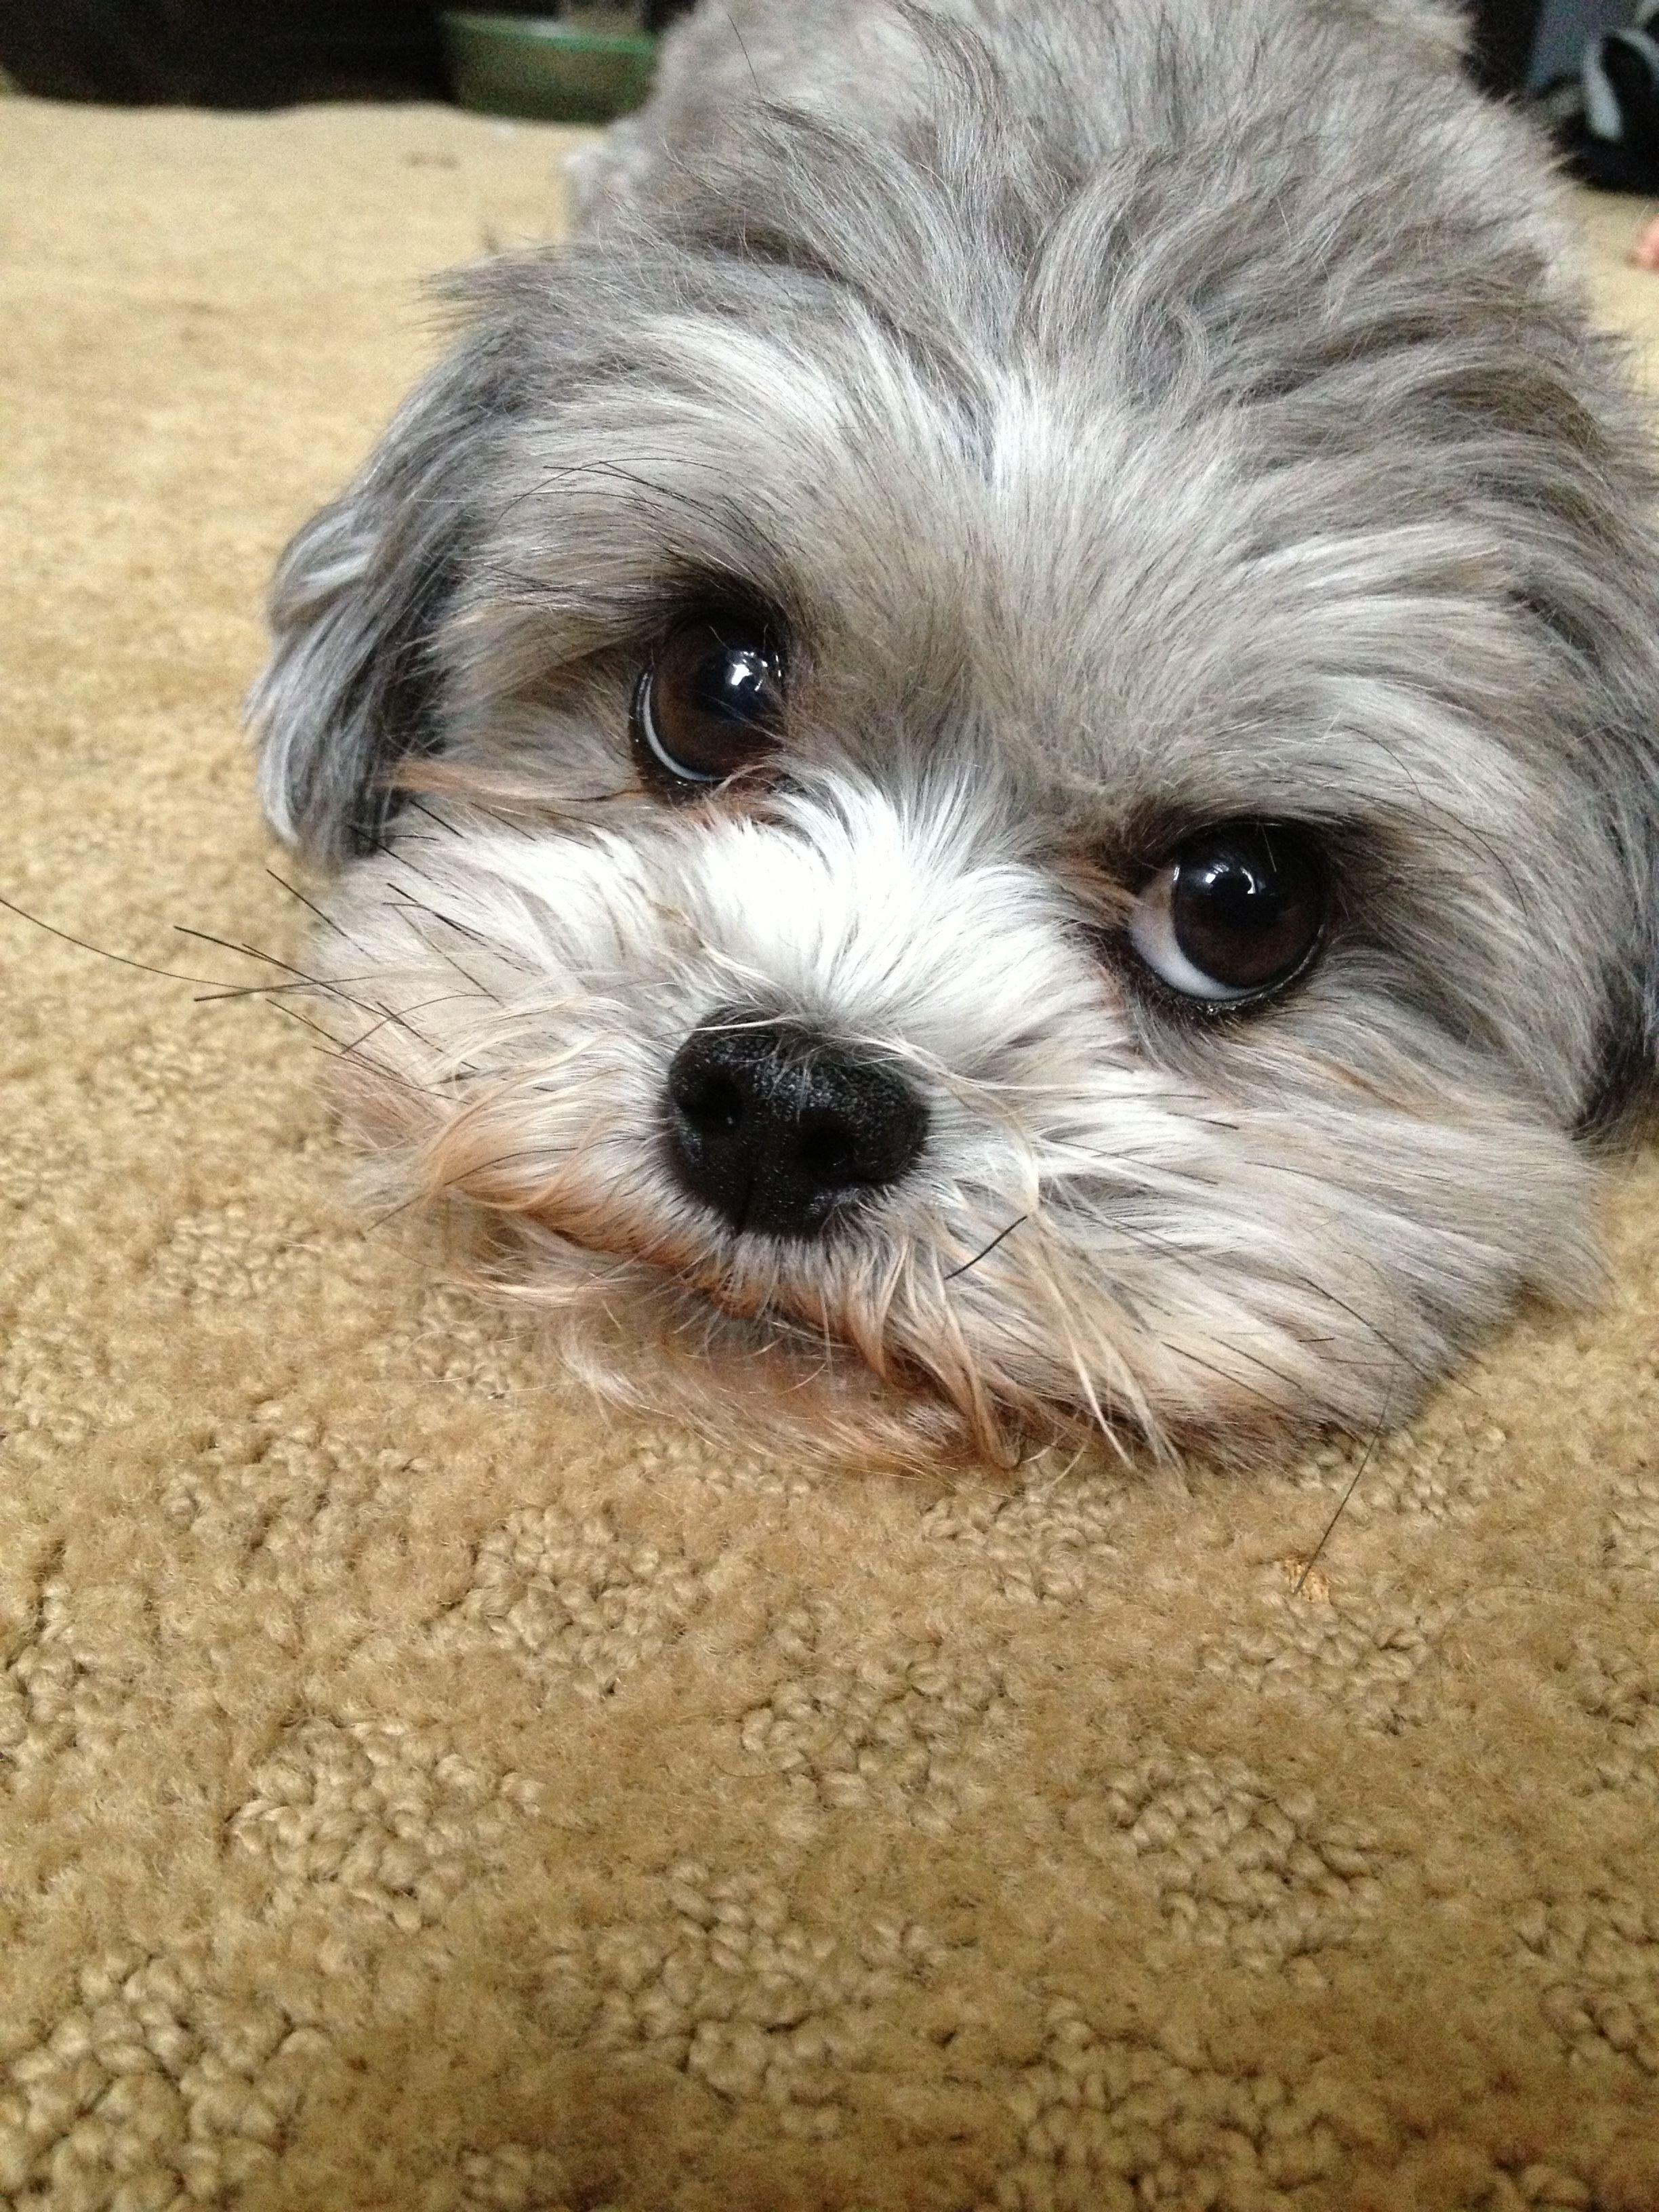 Looks like out little princess shitzu poodle mix adorable puppy